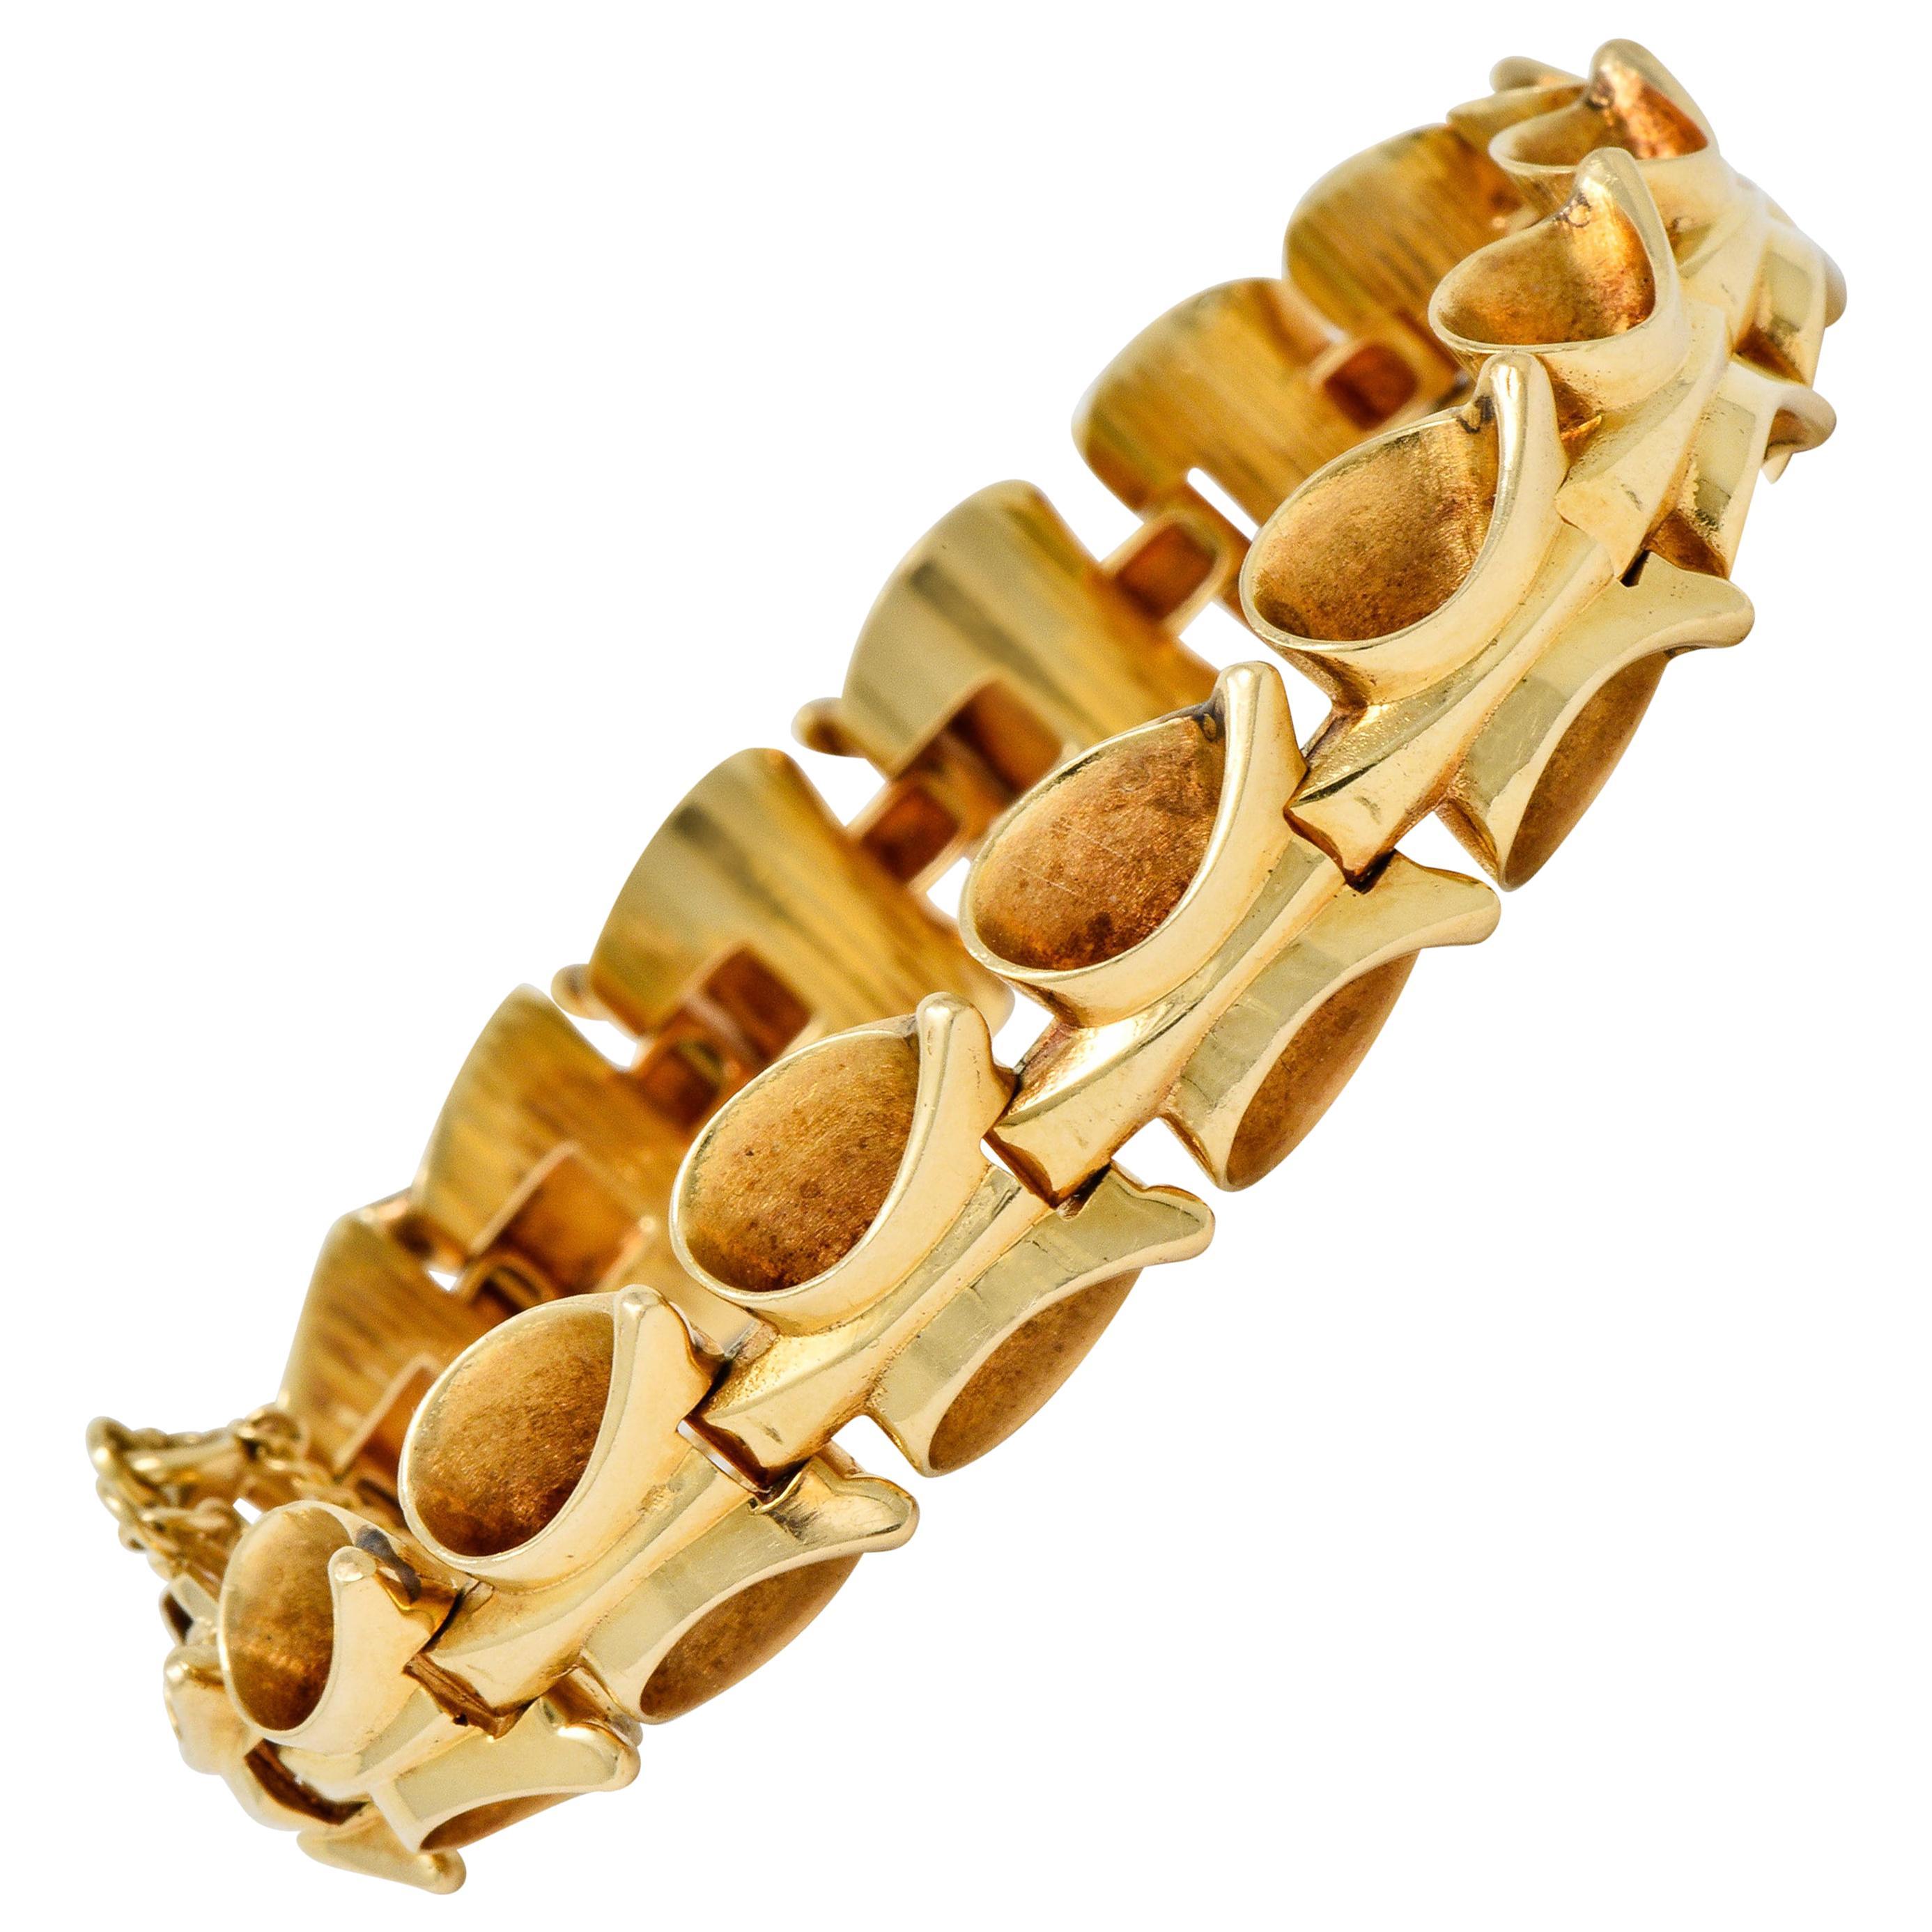 1940s Retro 14 Karat Yellow Gold Stylized Link Bracelet